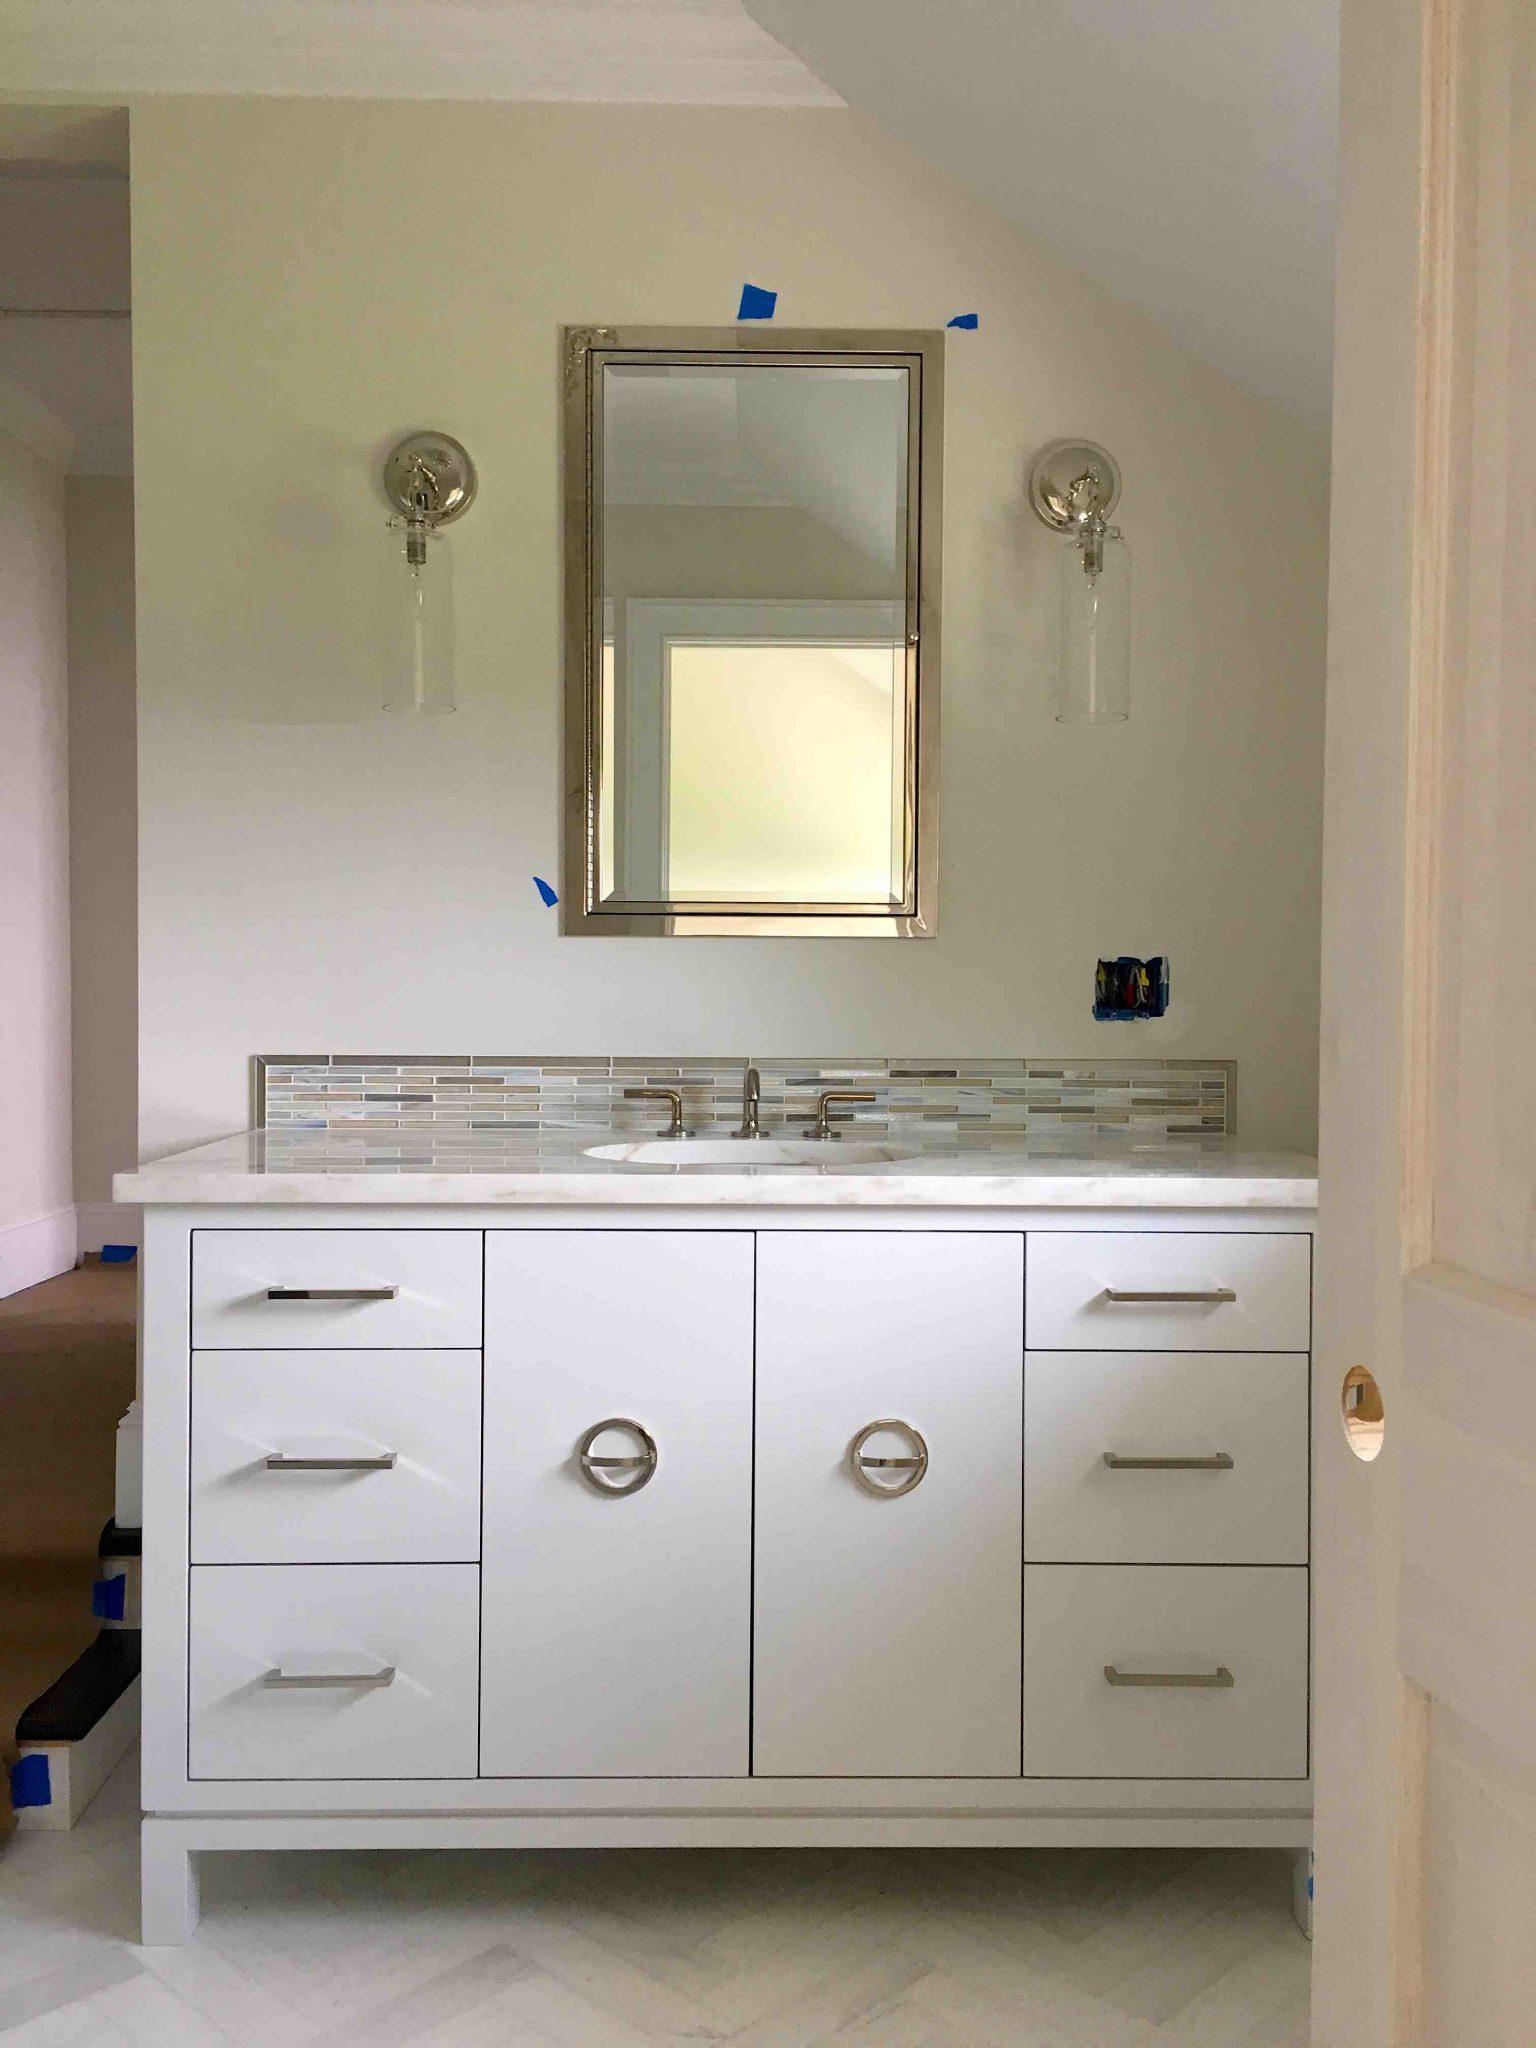 Bathroom - Dutchess County Home Renovation